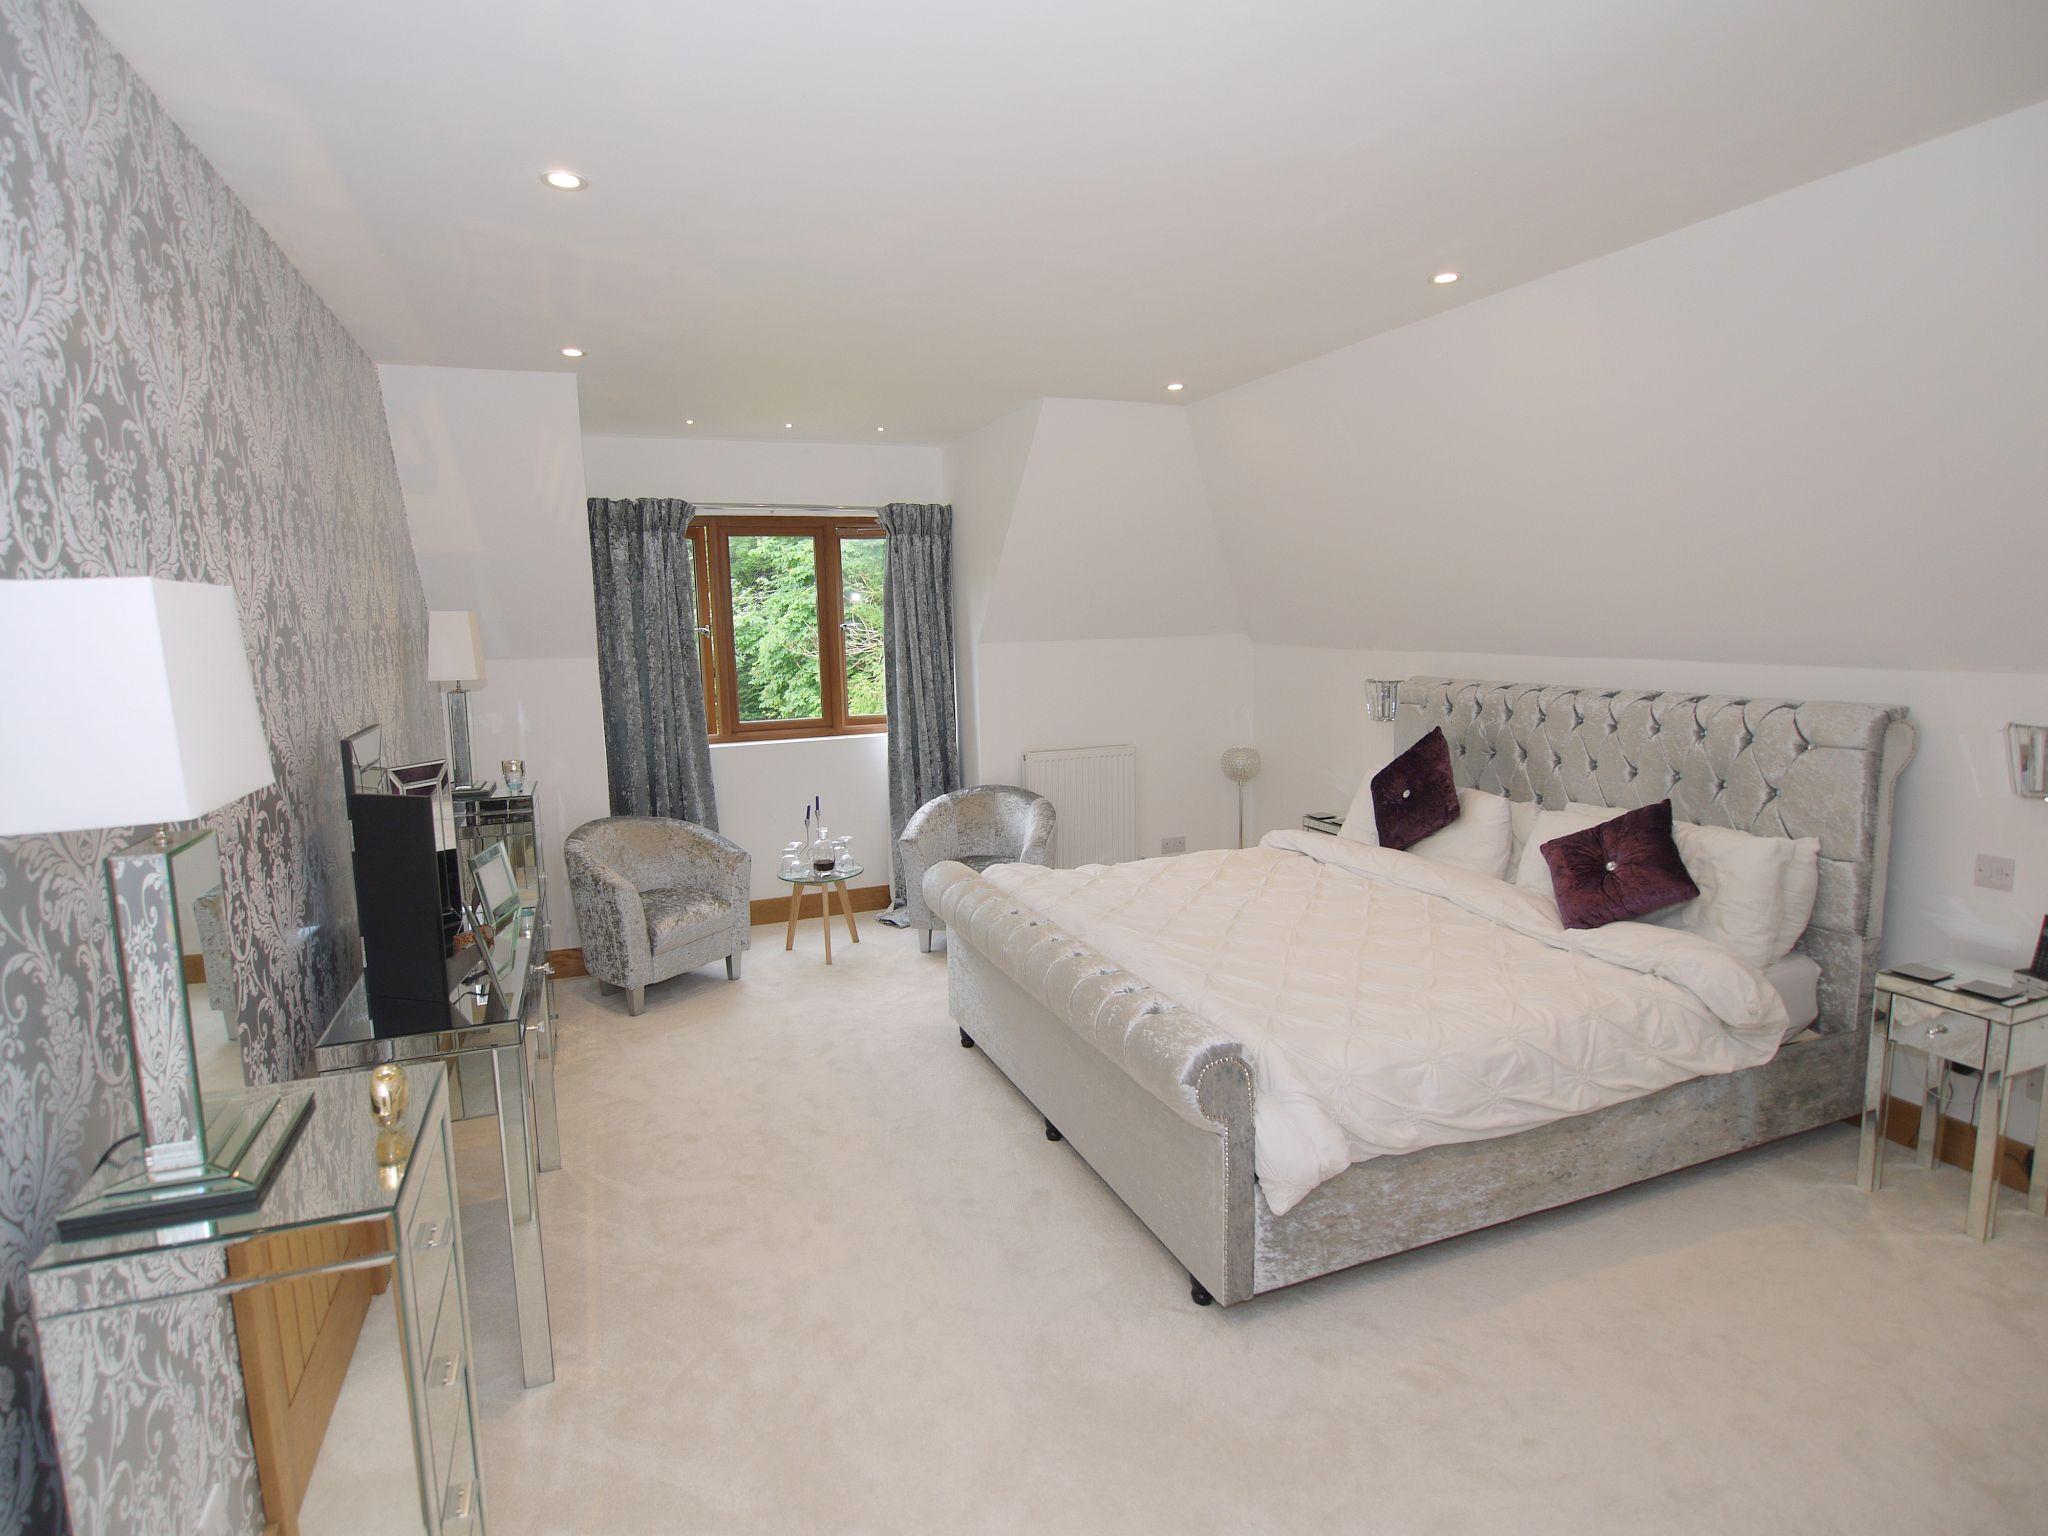 5 bedroom detached house Sold in Sevenoaks - Photograph 8